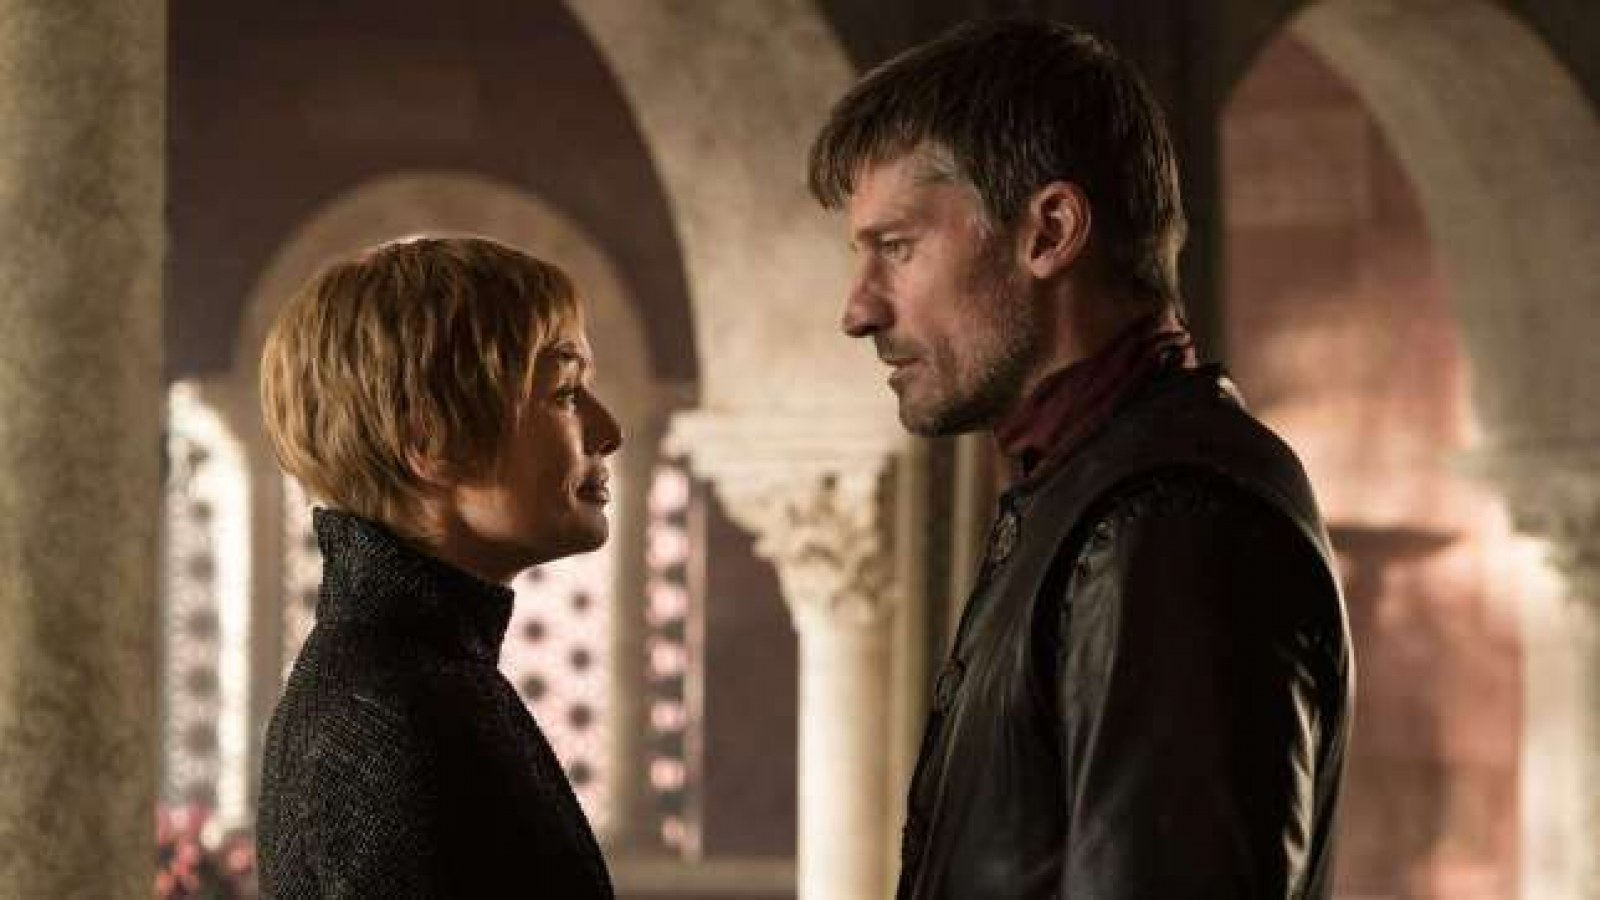 Game of Thrones' Star Nikolaj Coster-Waldau Hopes Jaime